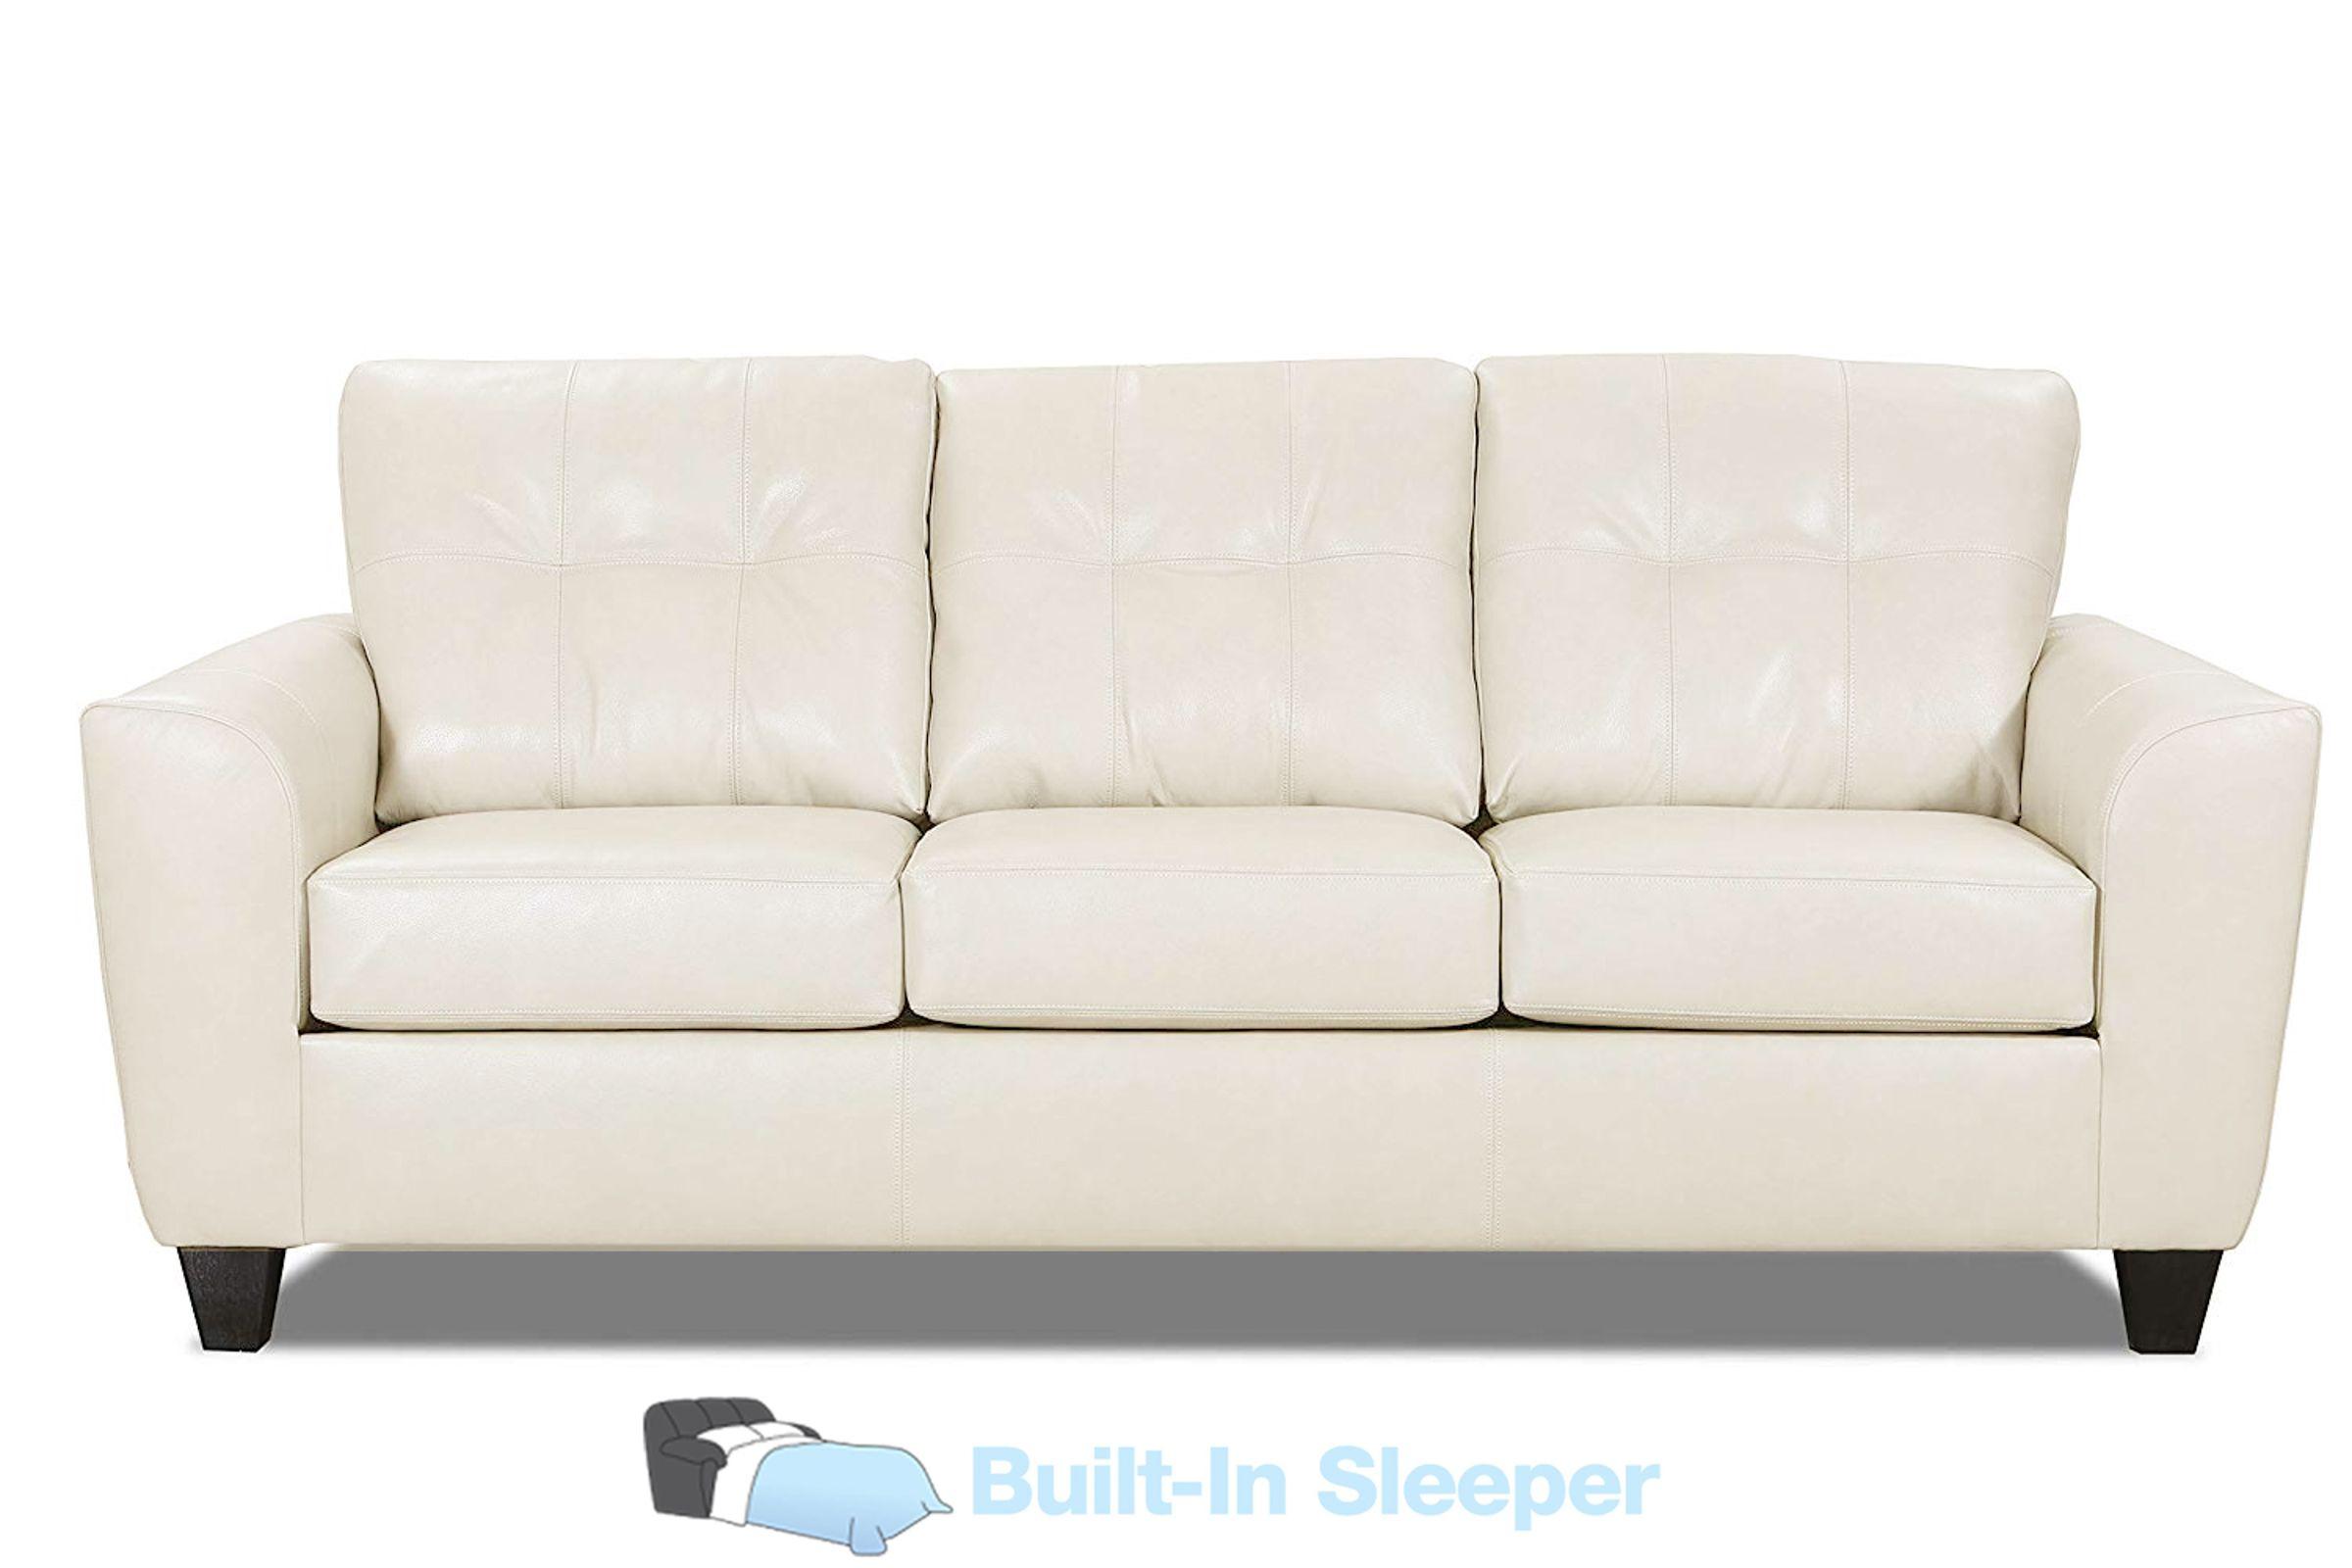 Cisco Leather Queen Sleeper Sofa At Gardner White